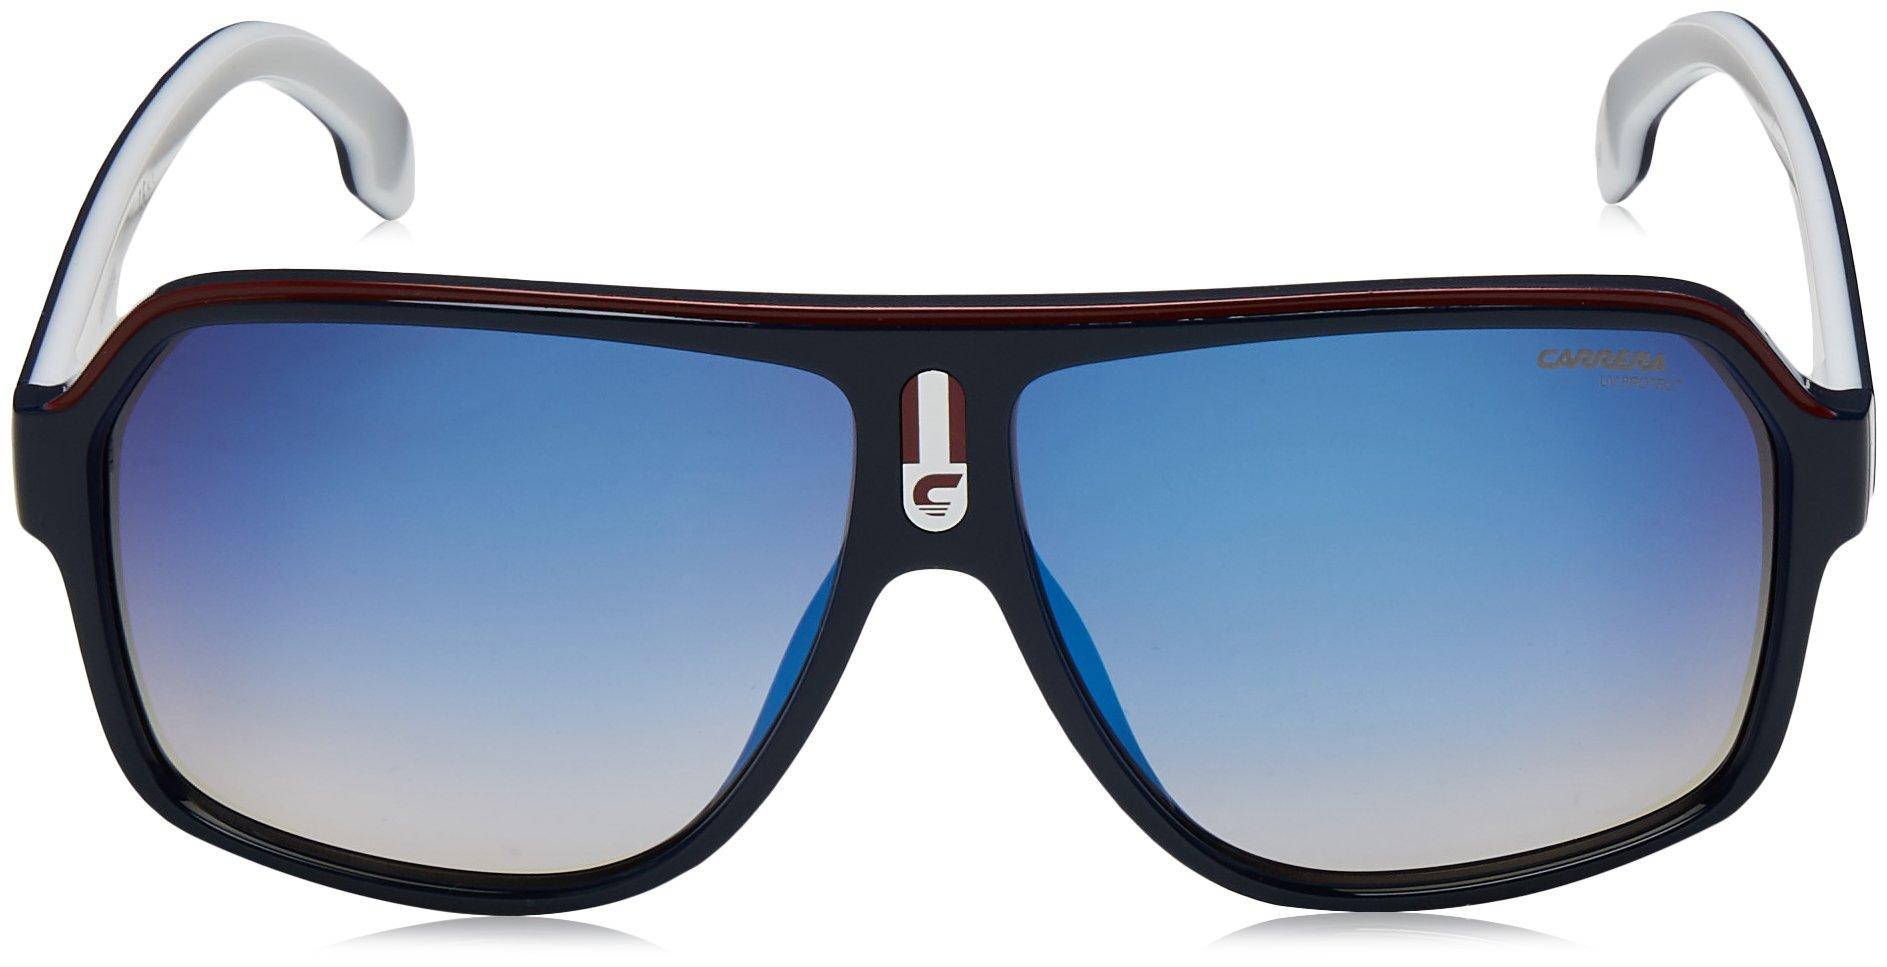 374edf3ef2dd Carrera Men's 1001/s Aviator Sunglasses, Blue RED, 62 mm | Jodyshop